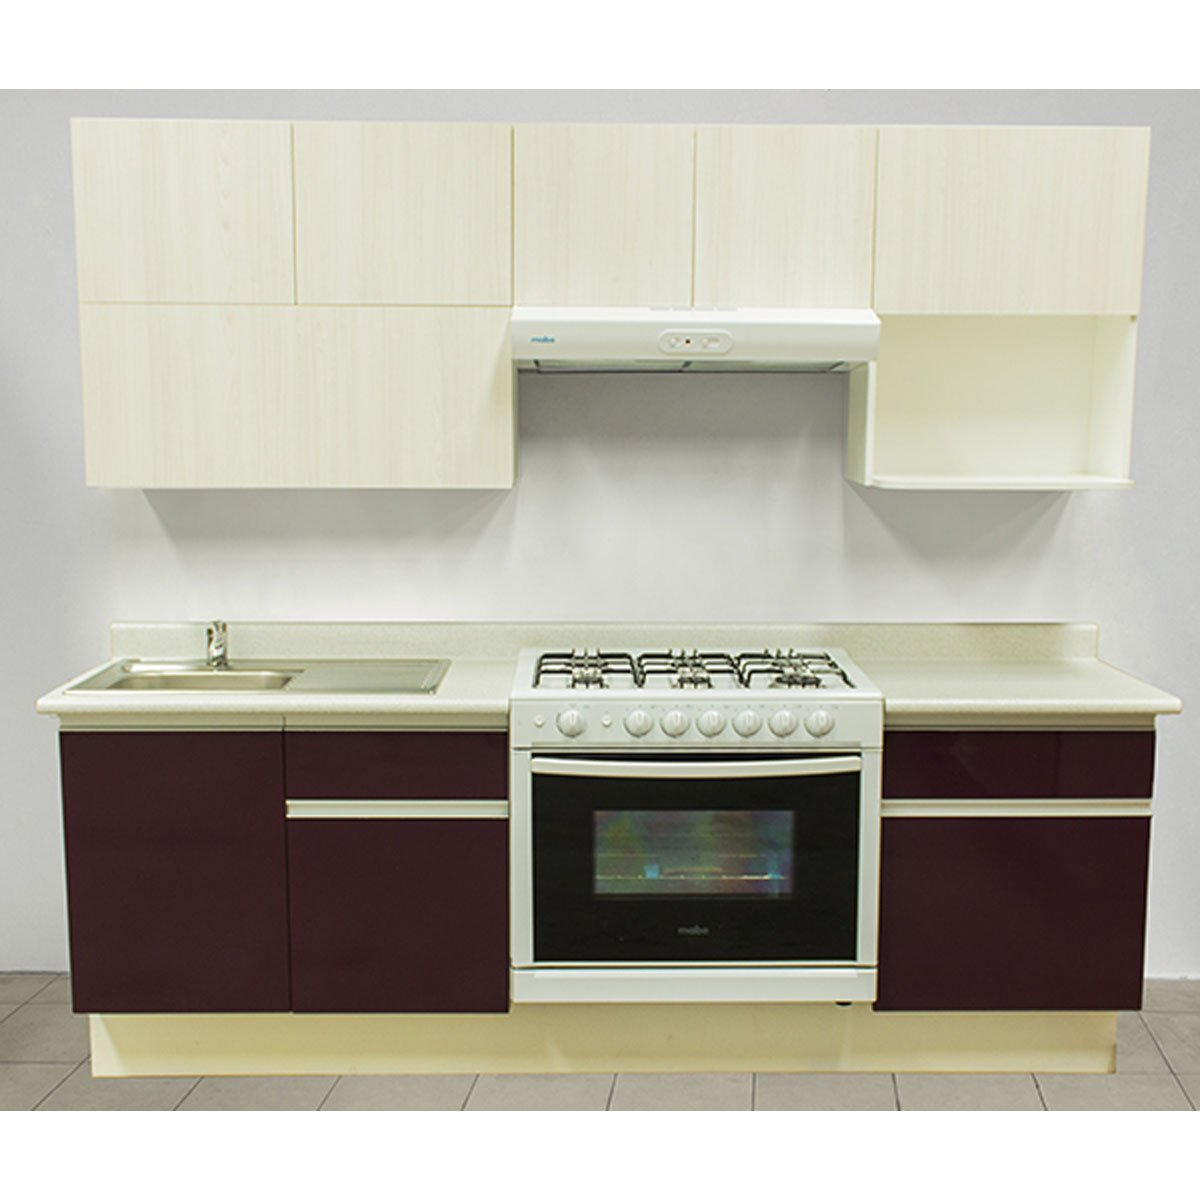 Cocina integral rouge estufa derecha tarja for Muebles para cocina integral